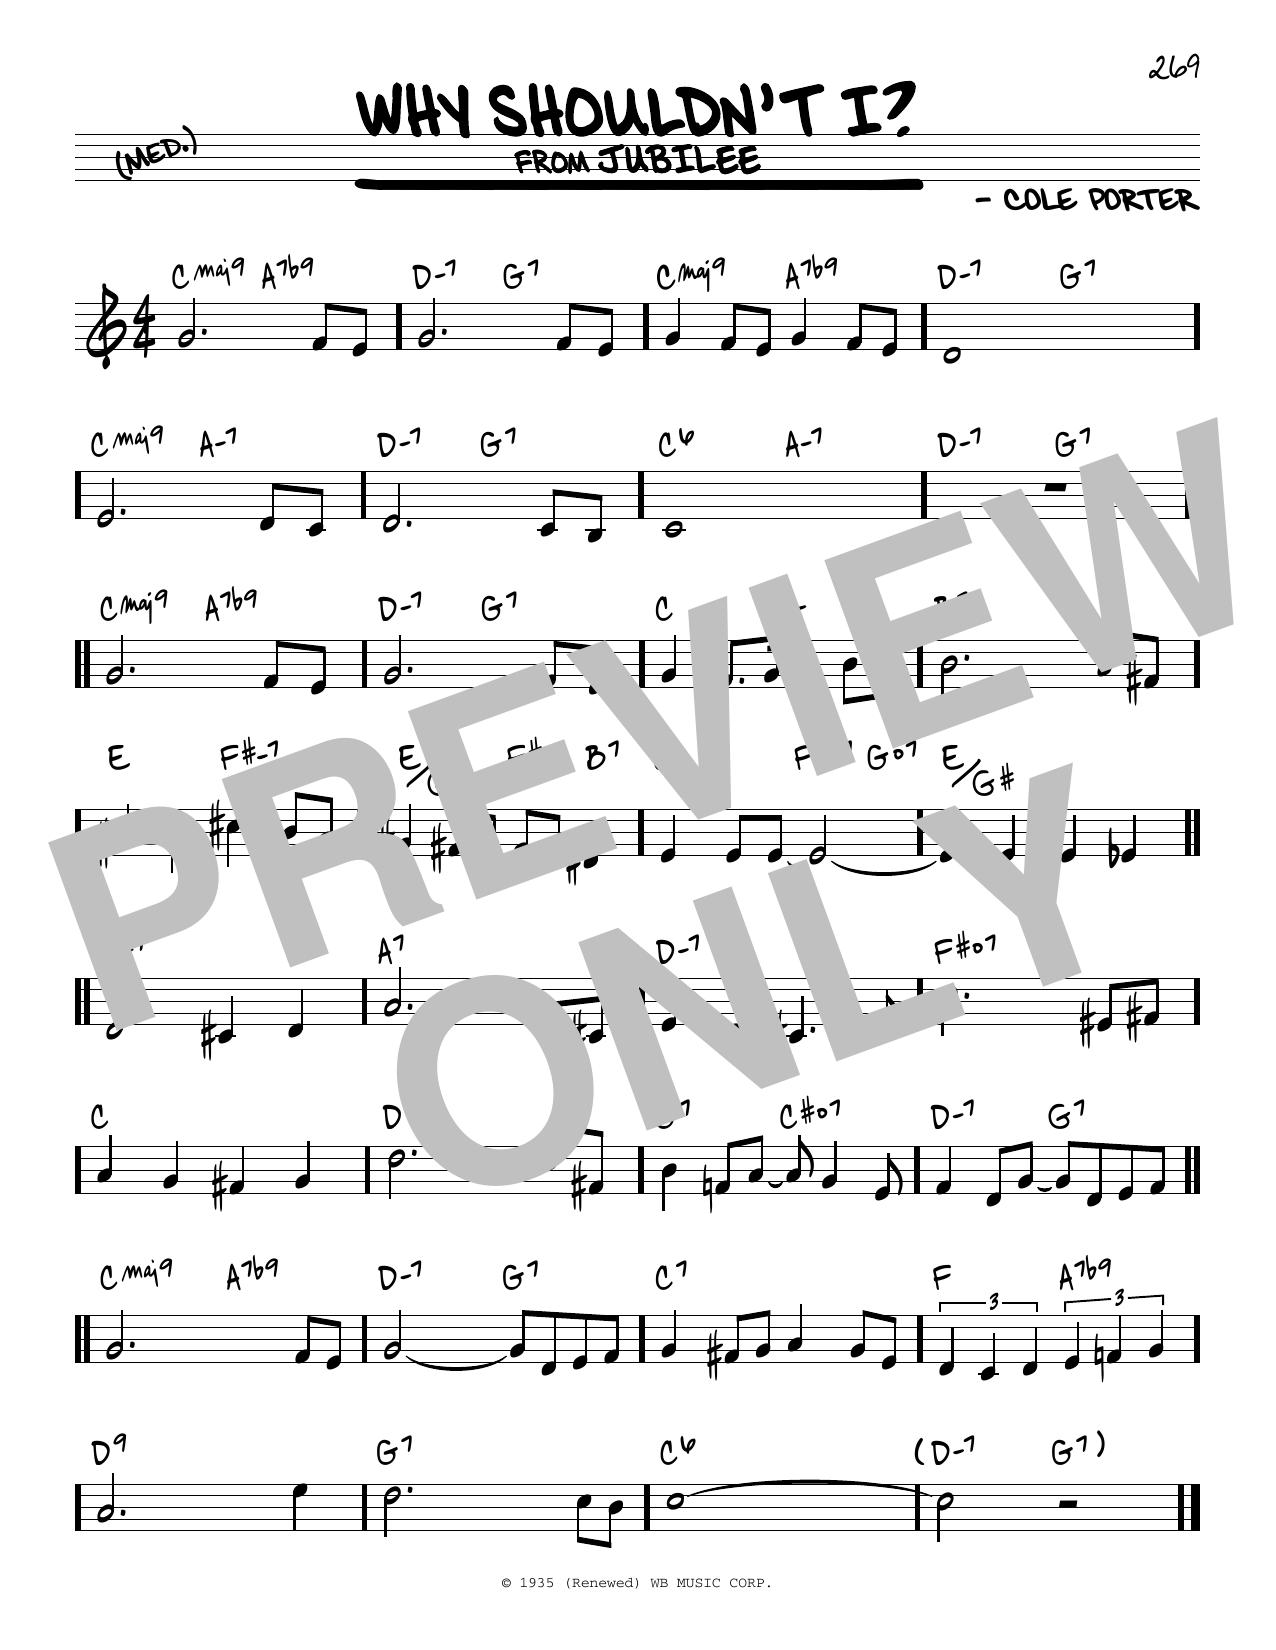 Why Shouldn't I? Sheet Music